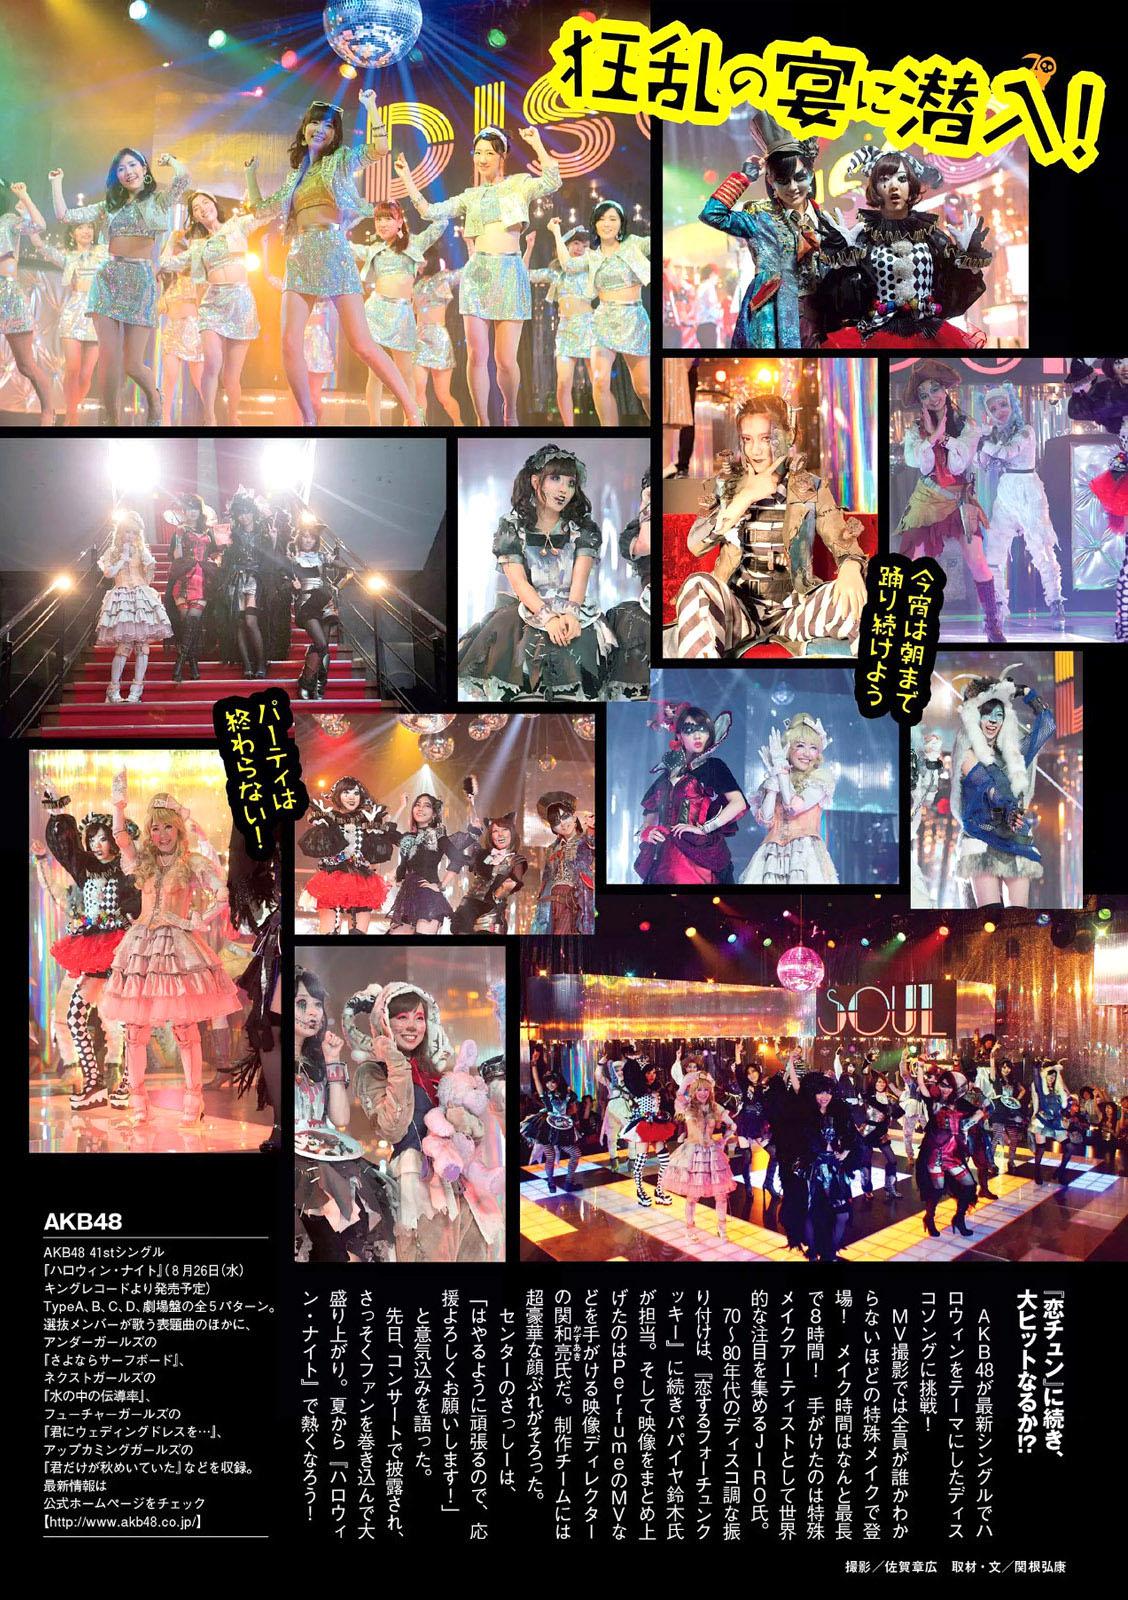 AKB48 WPB 150907 03.jpg